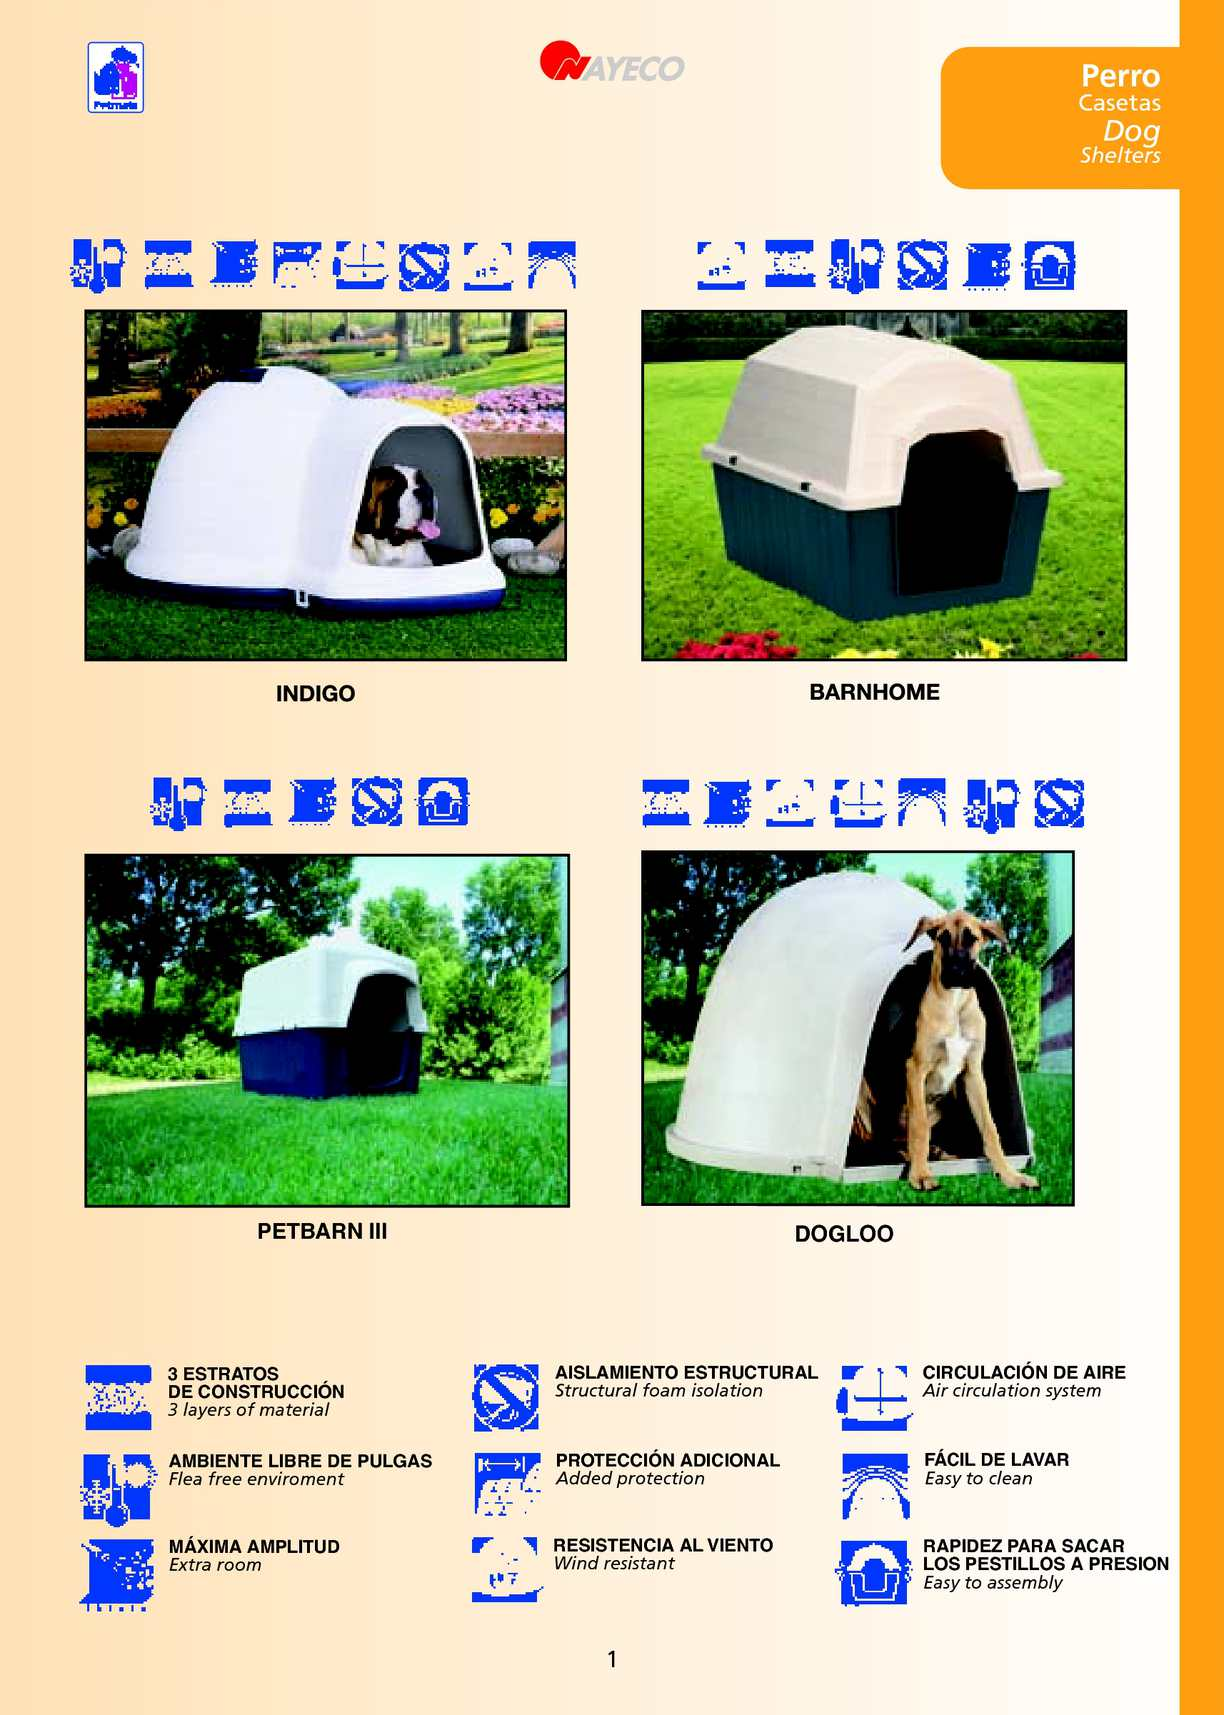 Calaméo - Catálogo Nayeco 2011-2012 dcafa70fccff8